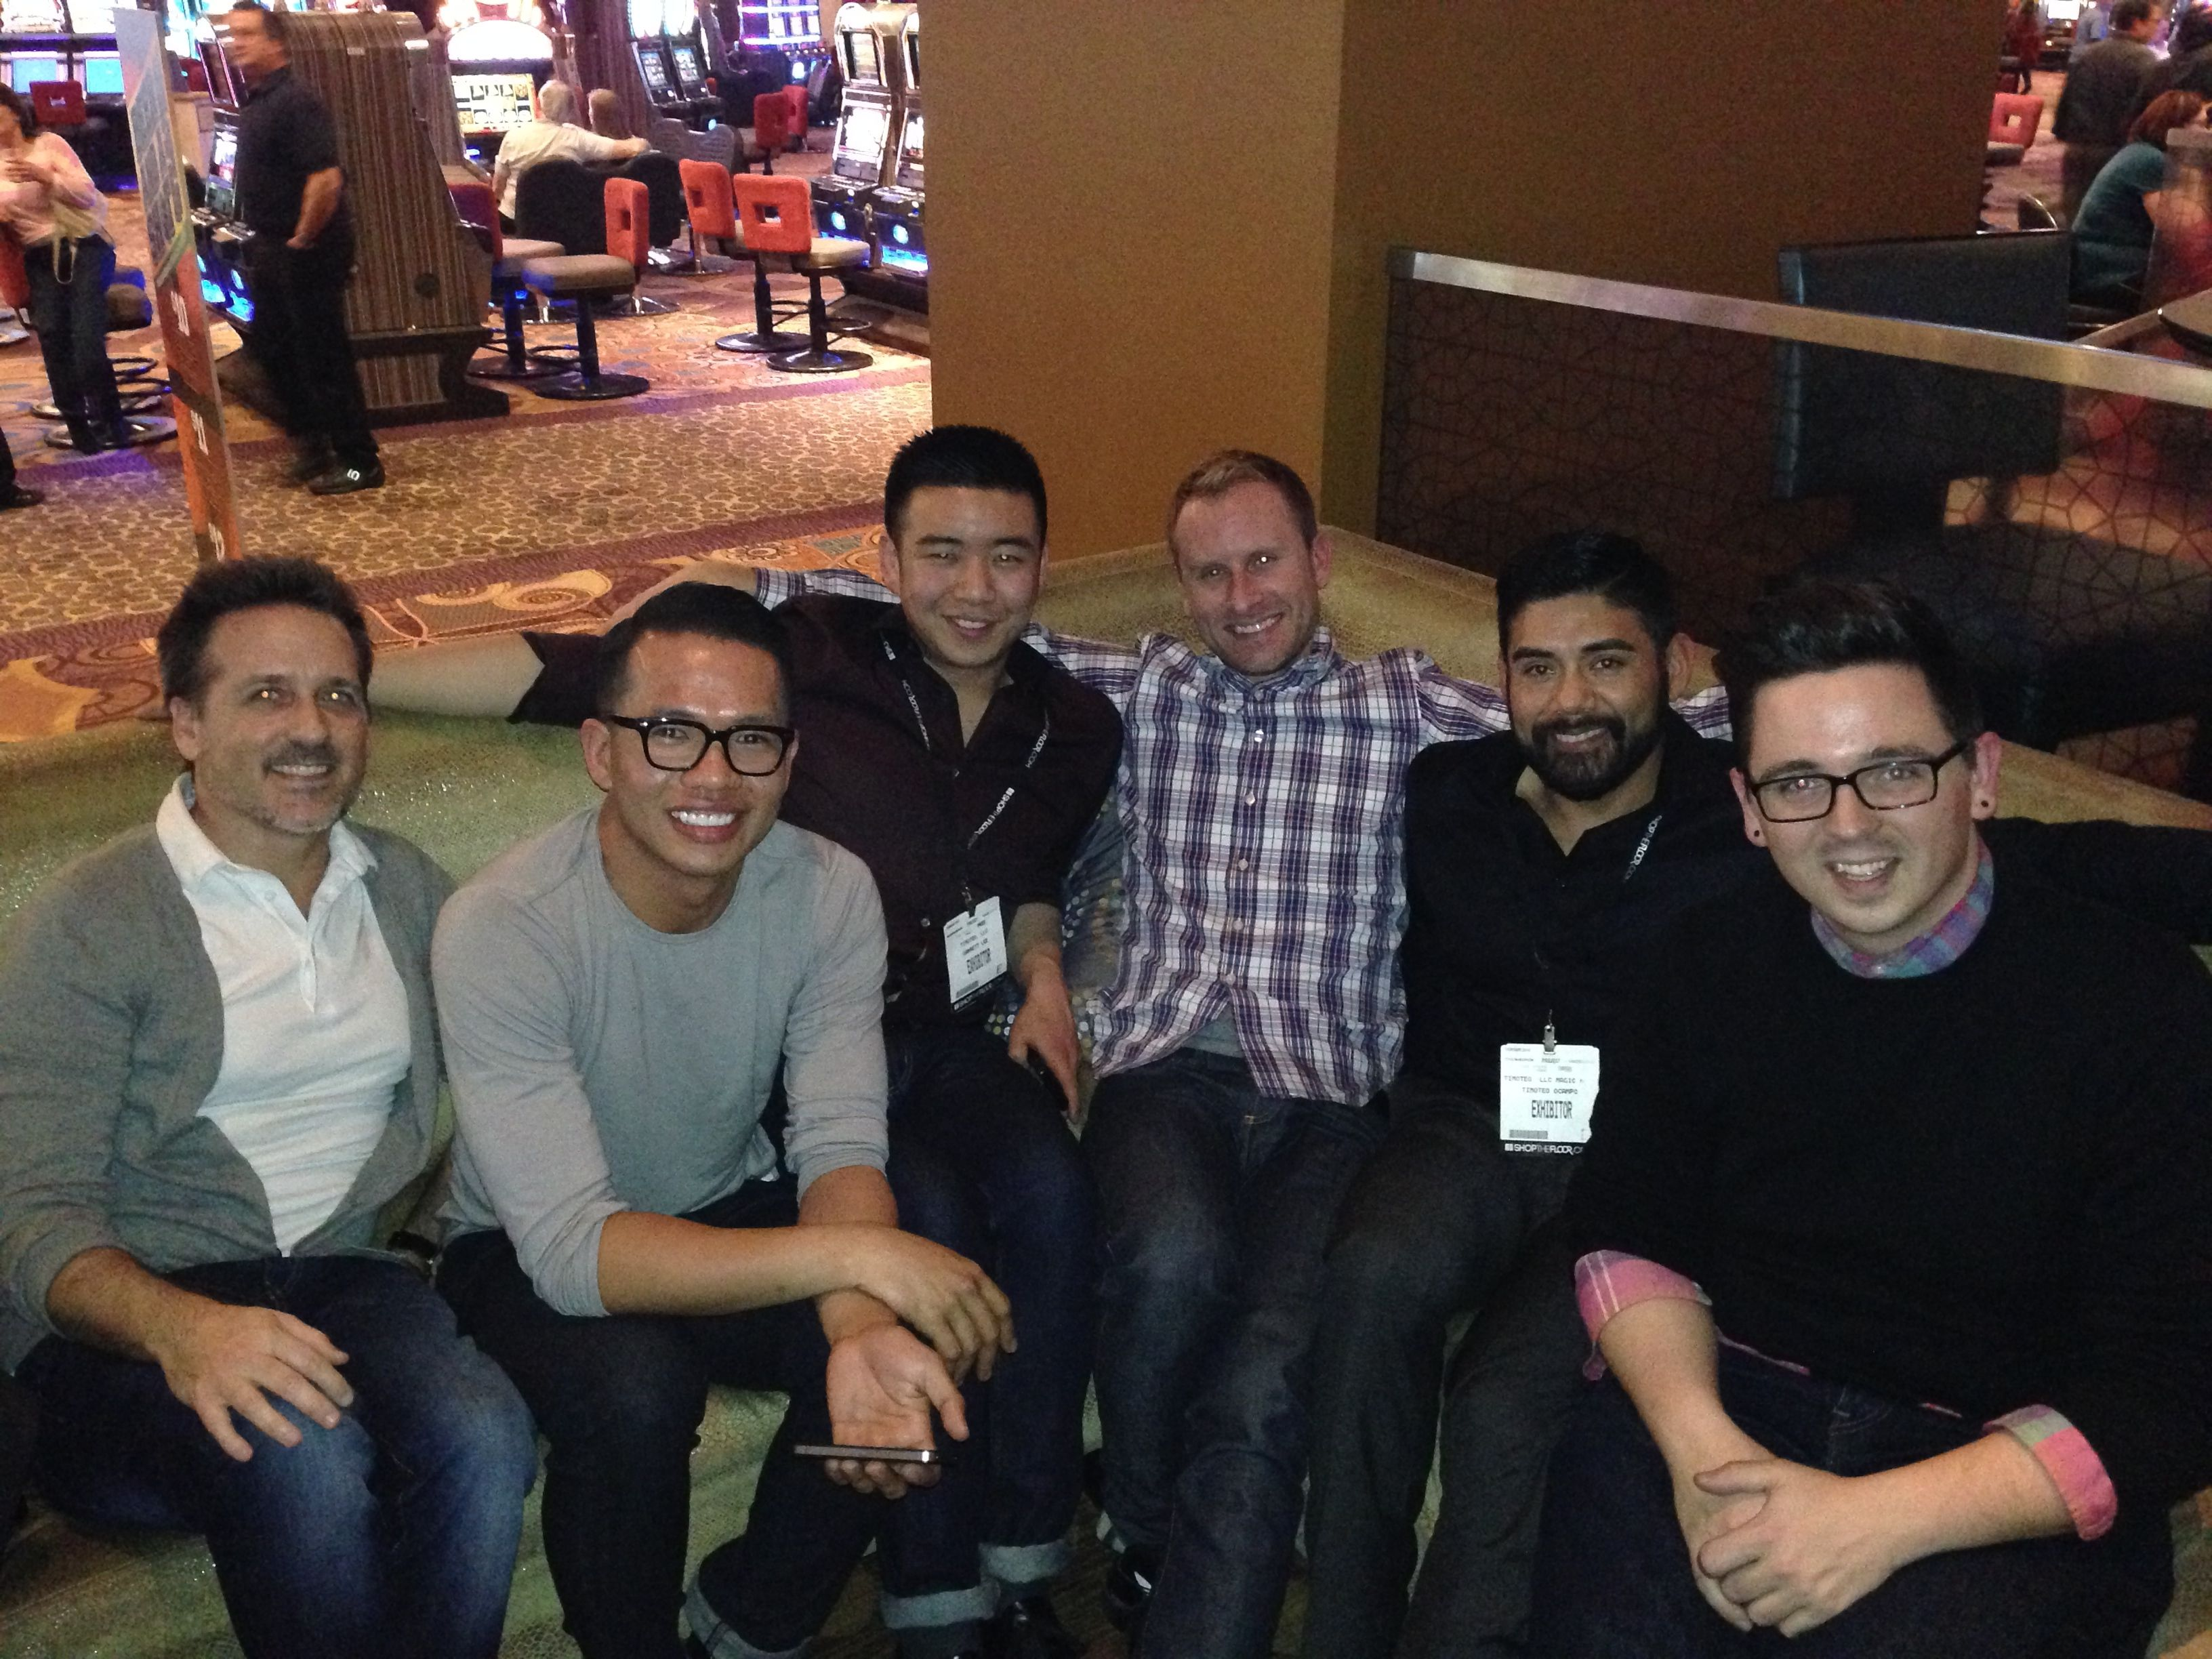 UNB in Vegas - The Social Gathering